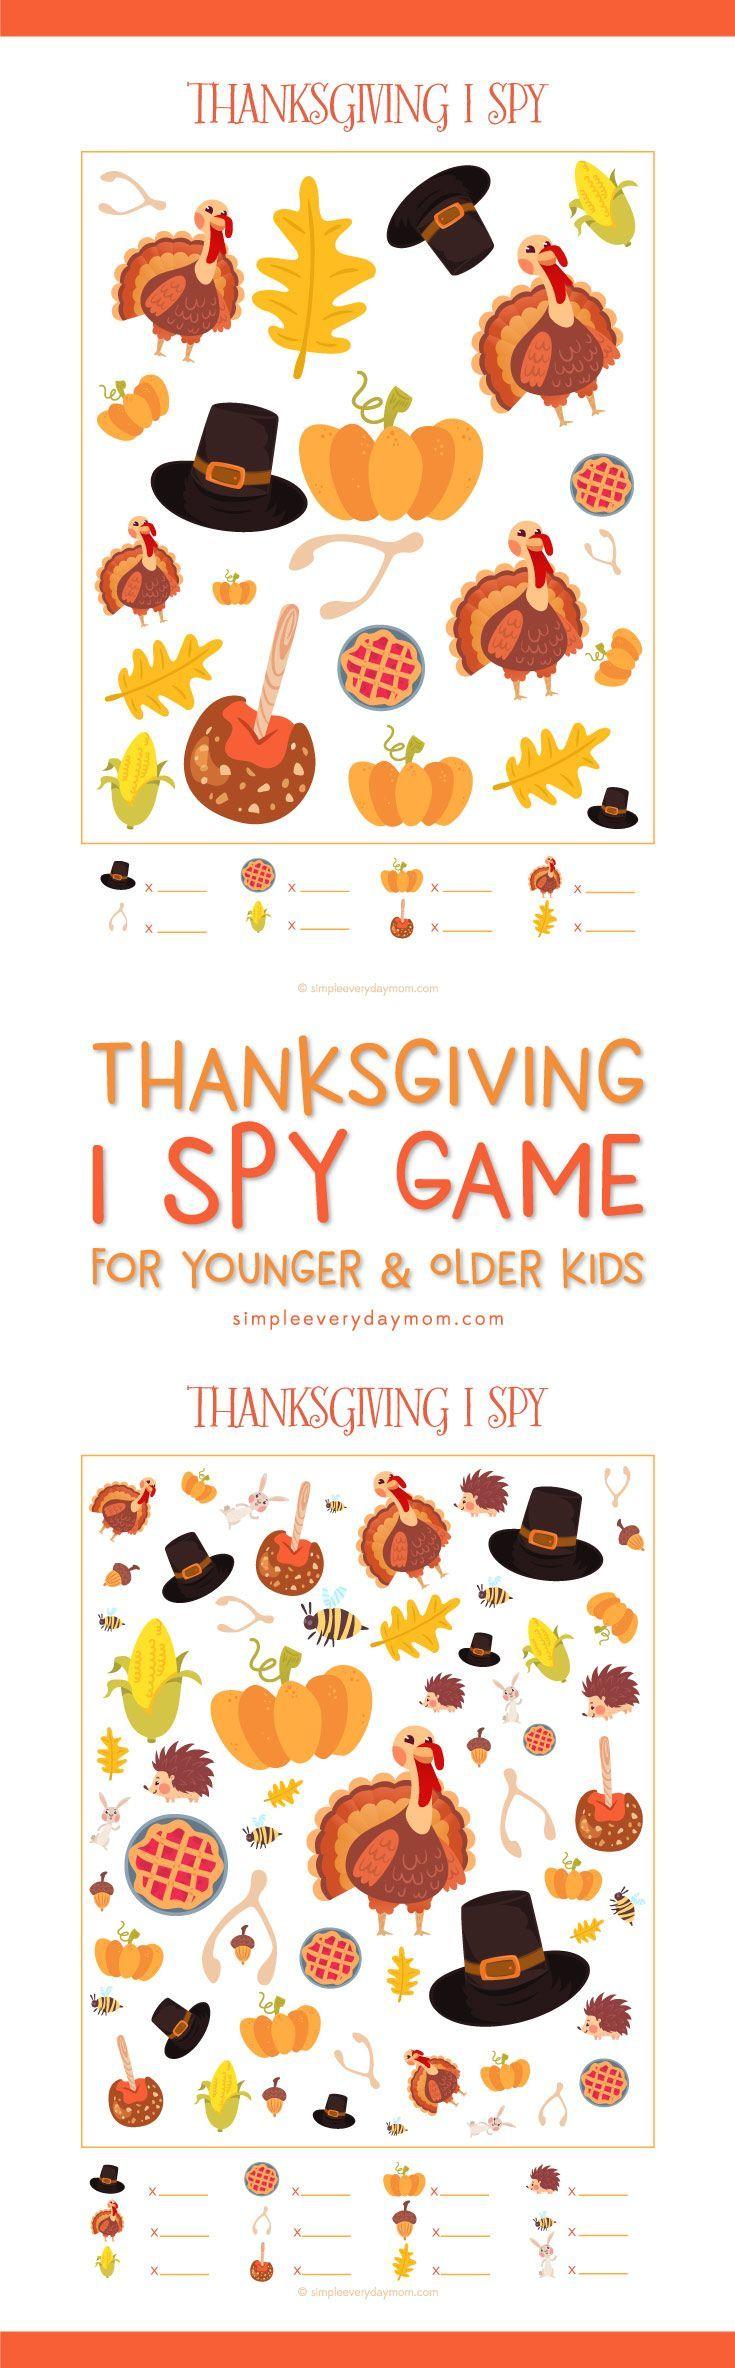 7 Fun Thanksgiving Activities For Kids To Celebrate Gratitude | Spy ...